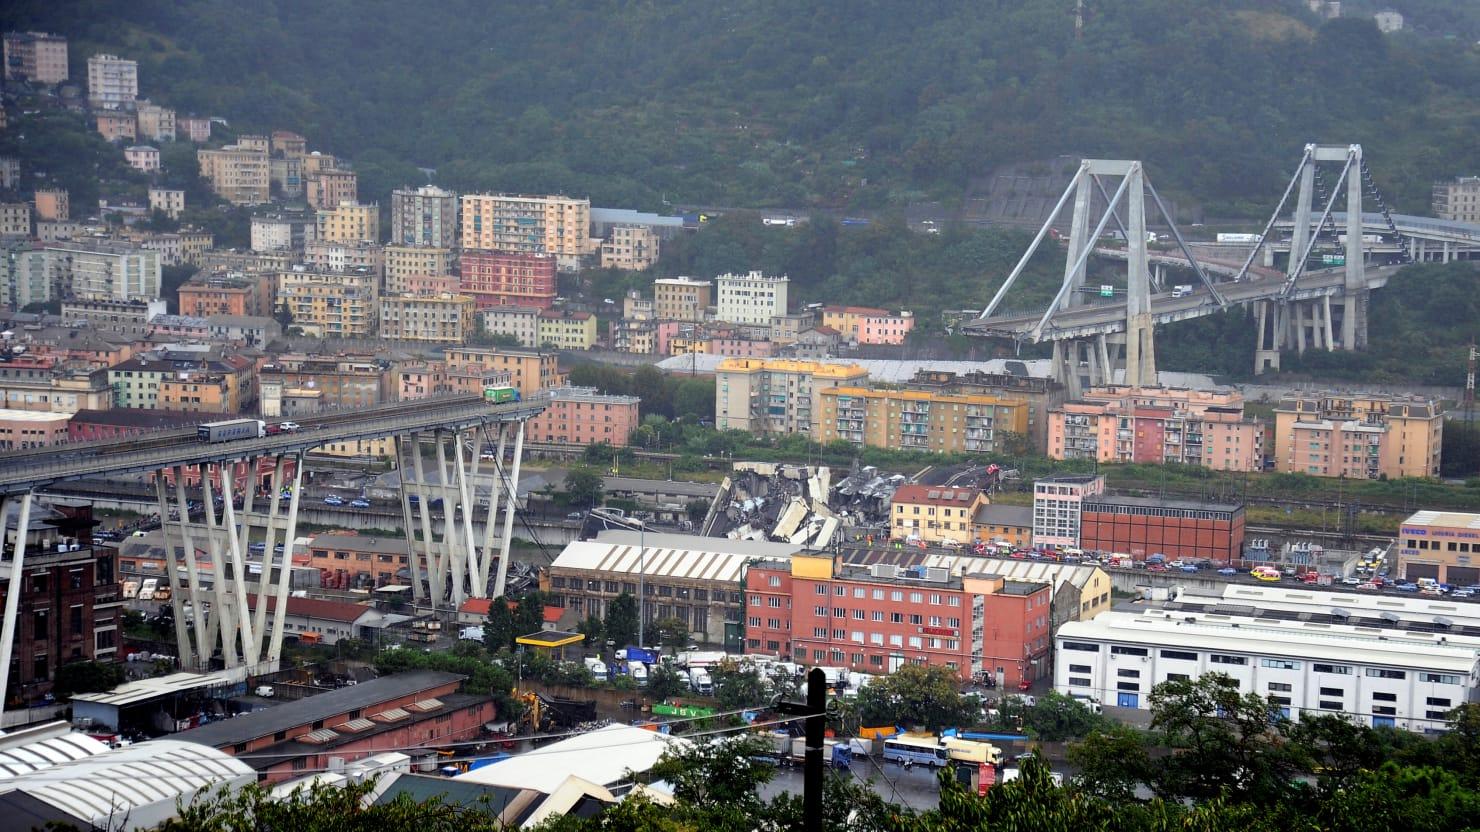 Viaduct Genova prabusit